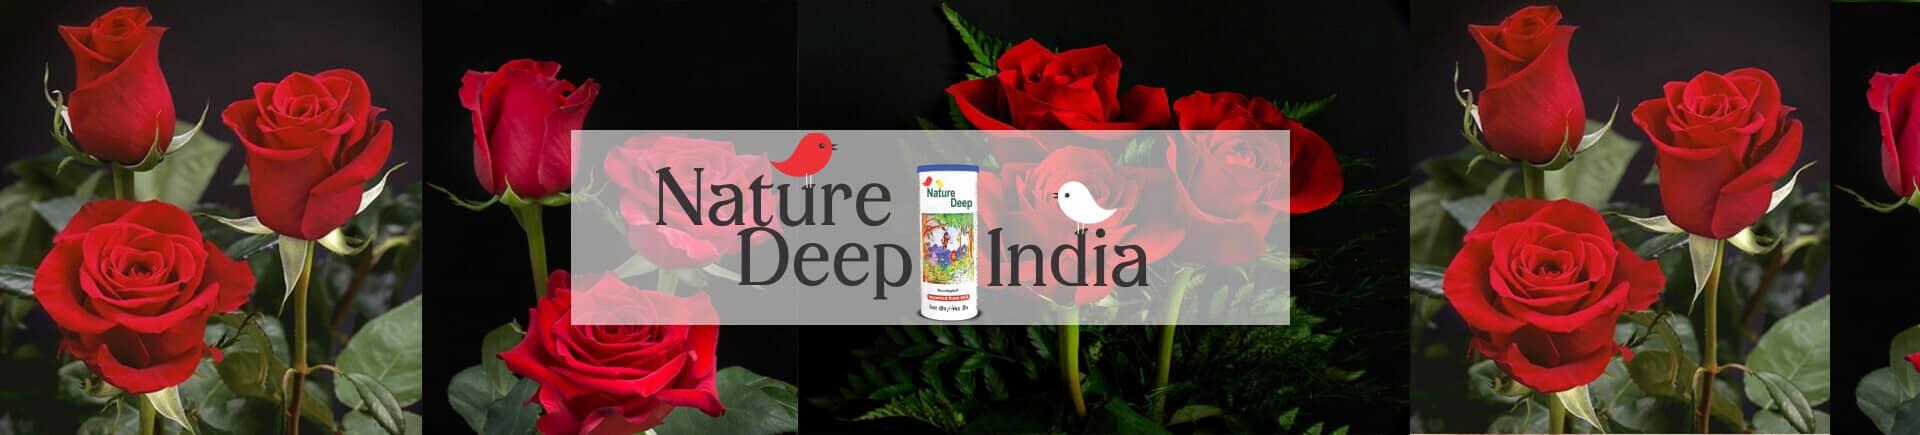 sumitomo naturedeep for rose crop desktop banner